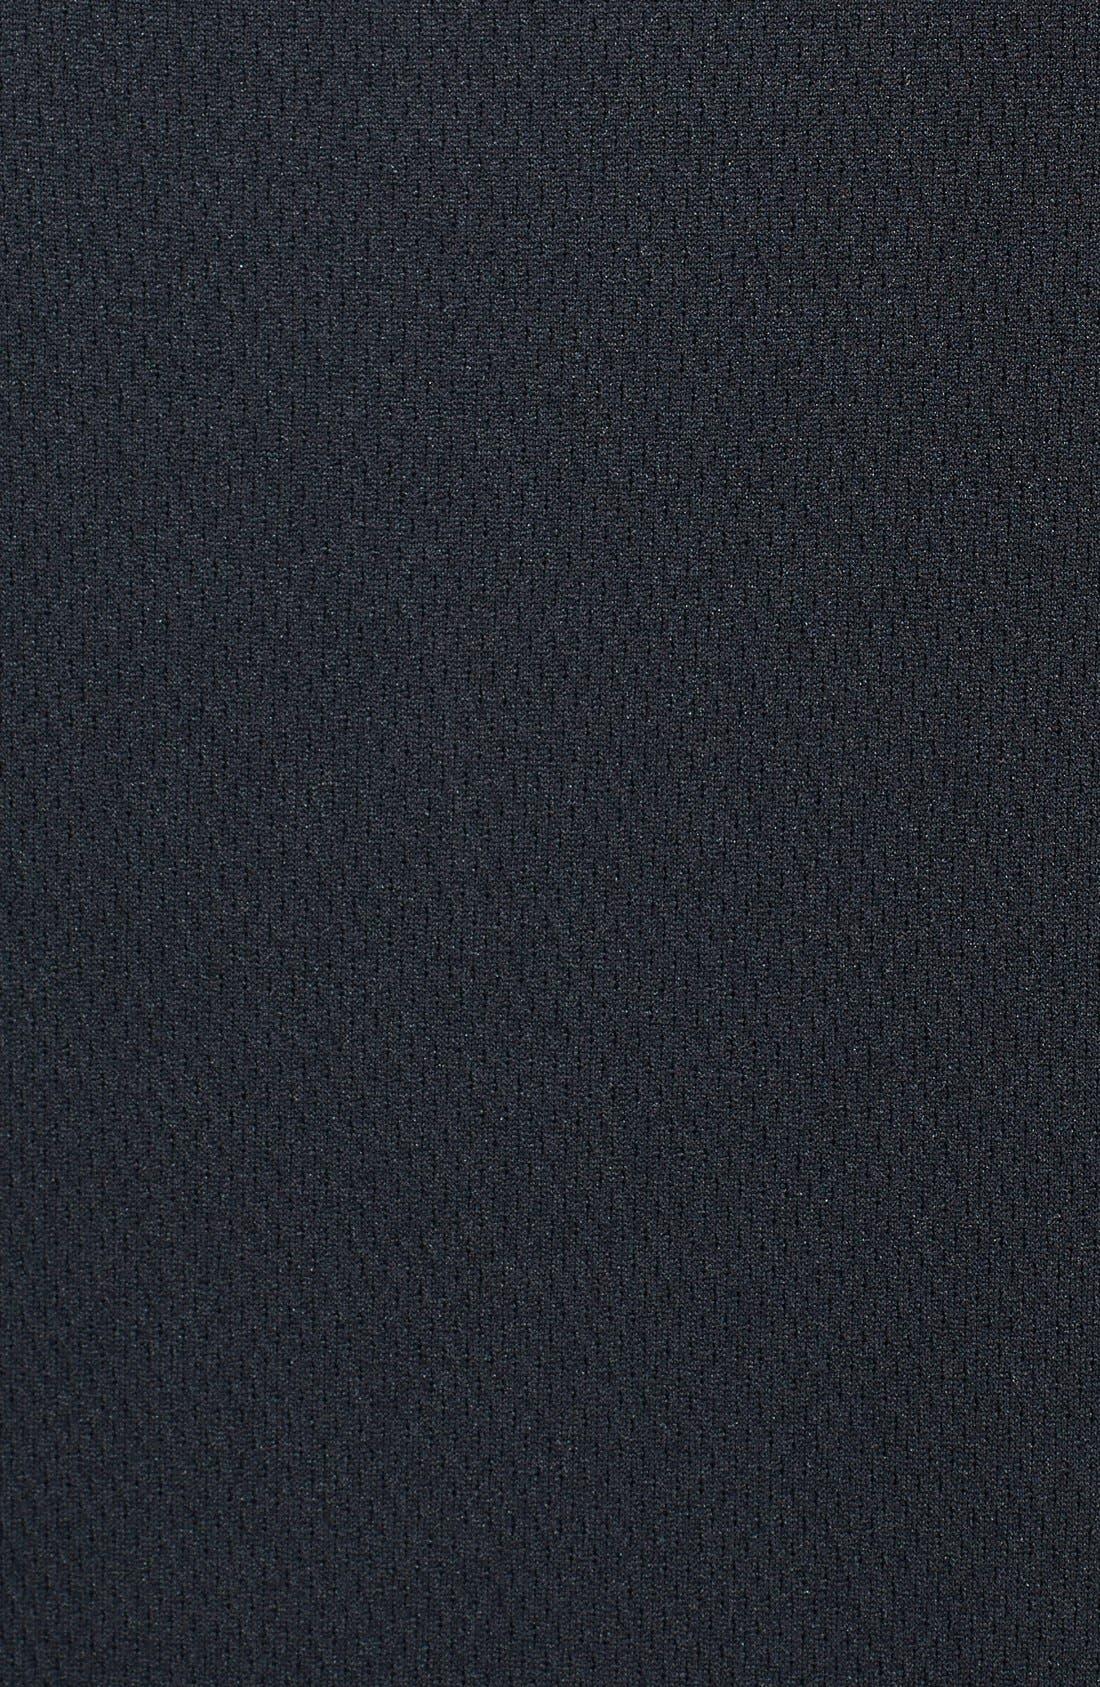 Miami Dolphins - Edge DryTec Moisture Wicking Half Zip Pullover,                             Alternate thumbnail 3, color,                             001